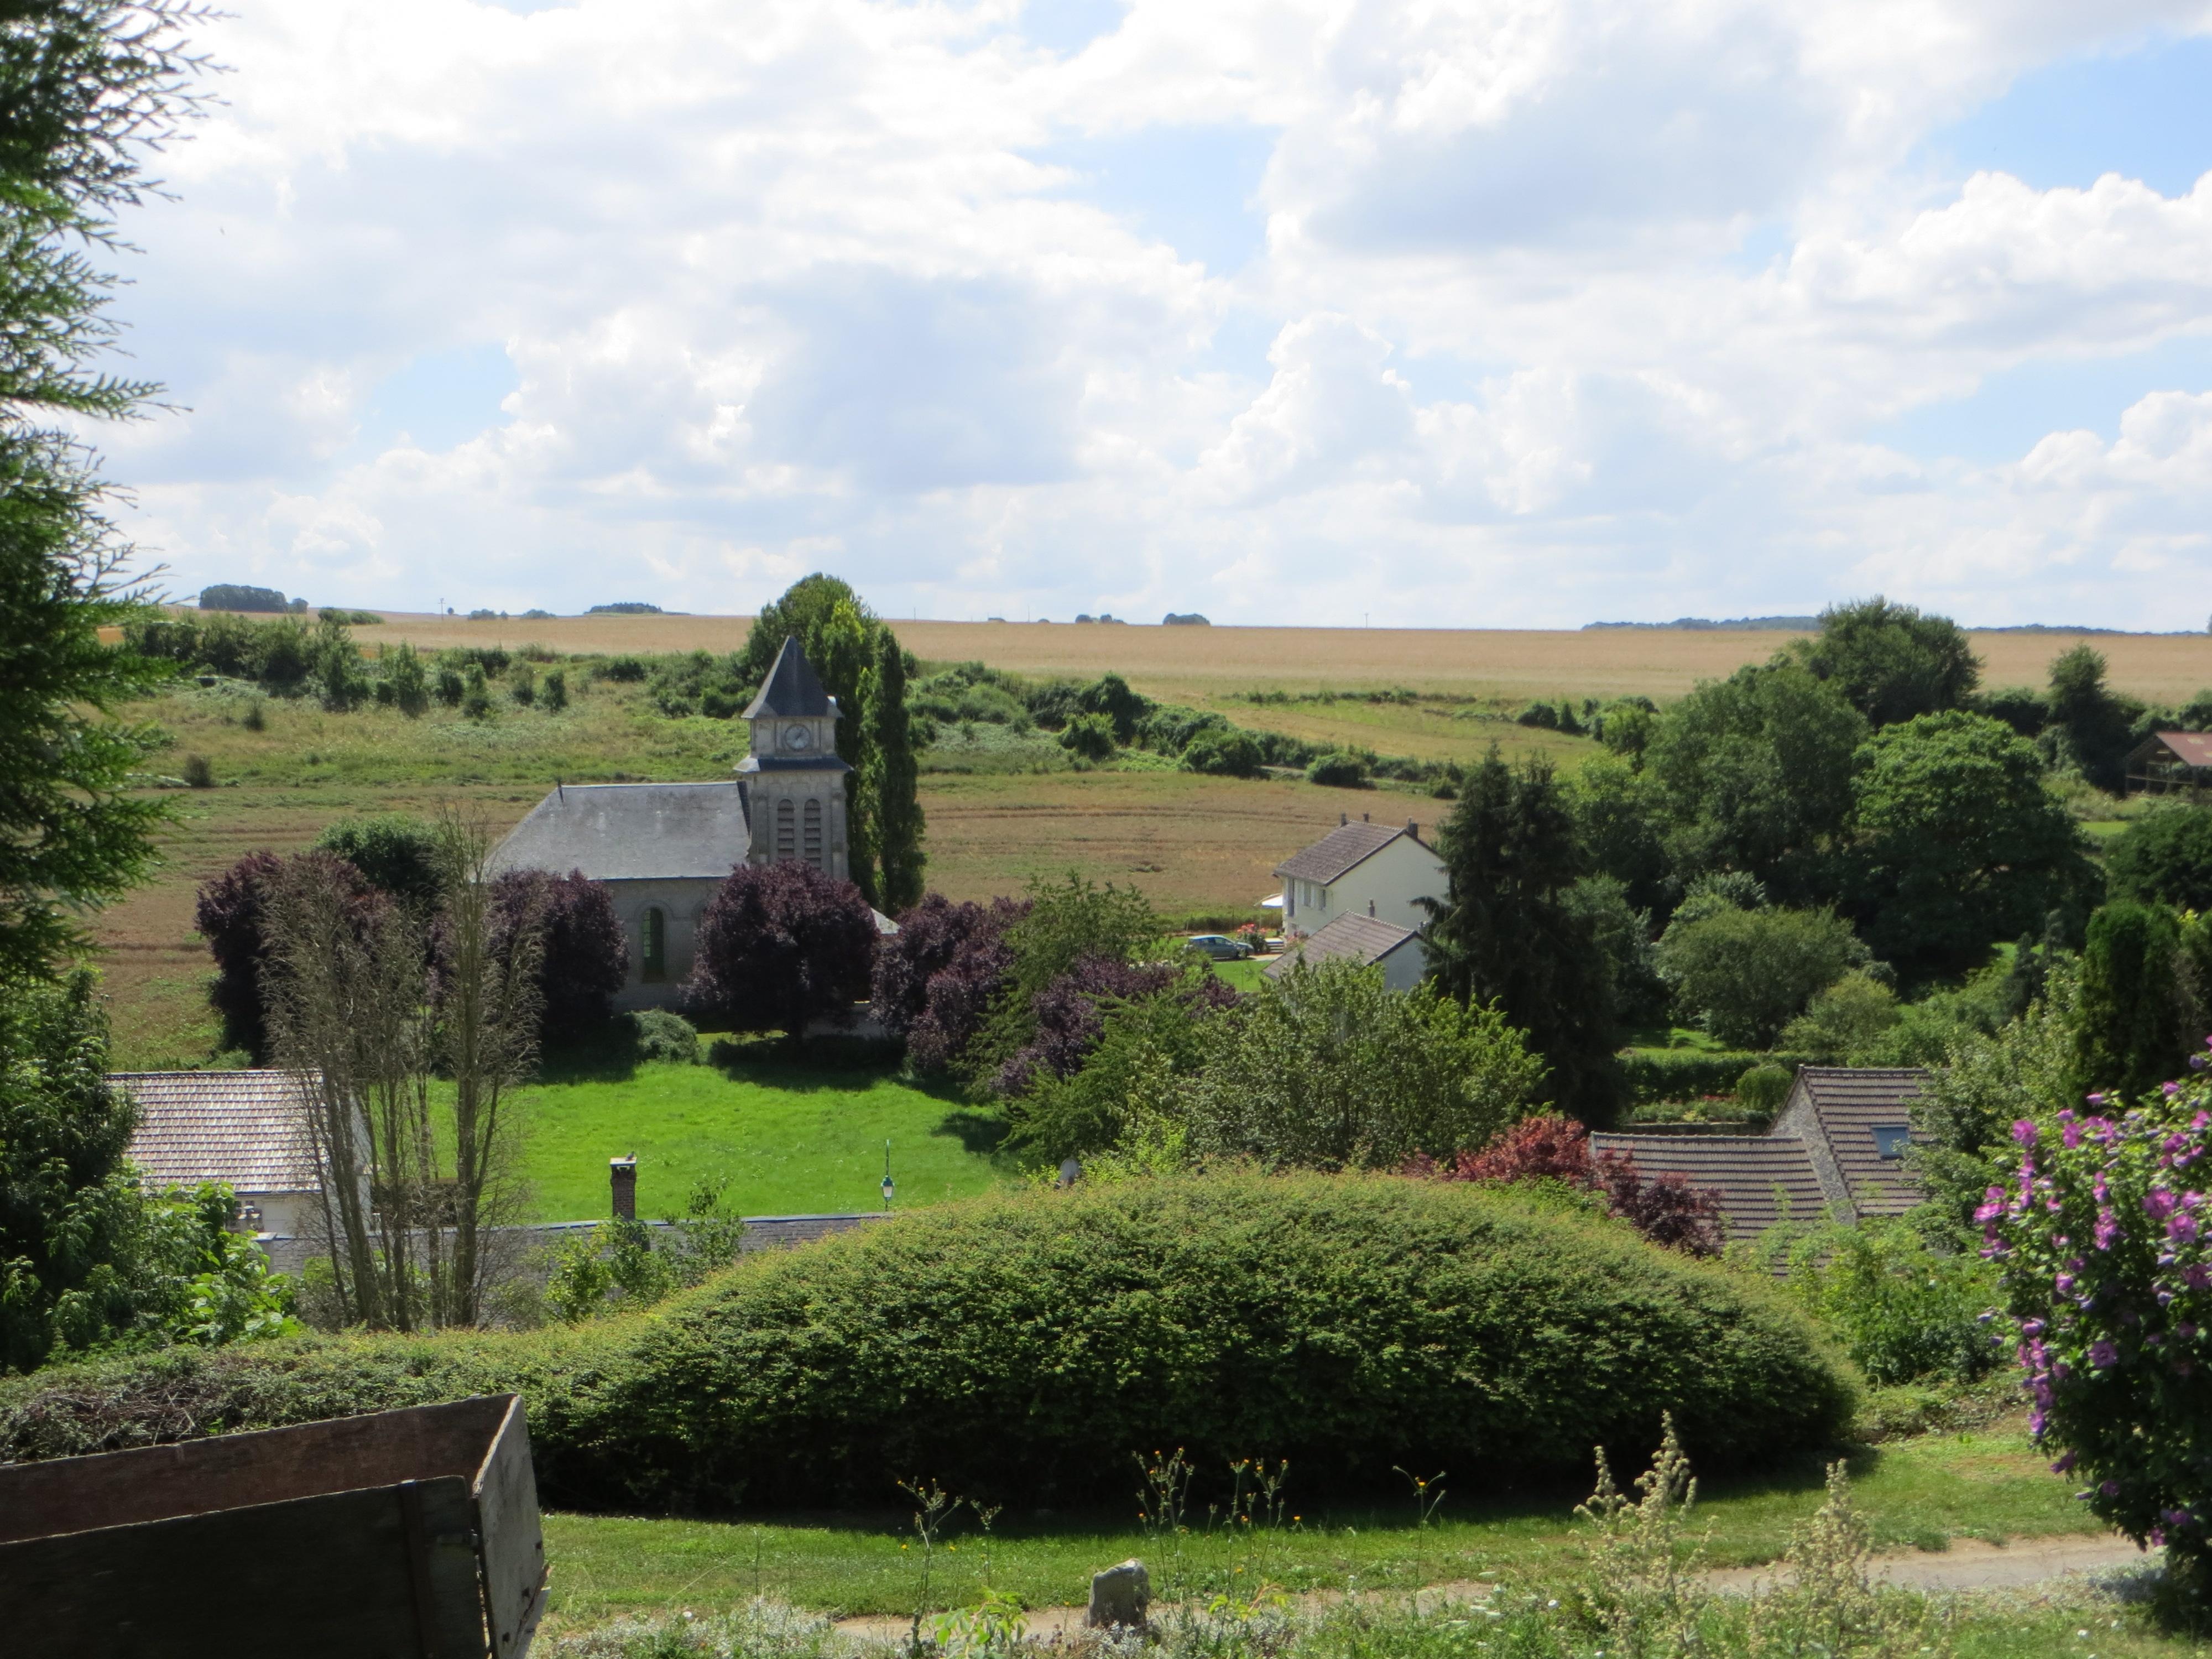 Launoy, Aisne